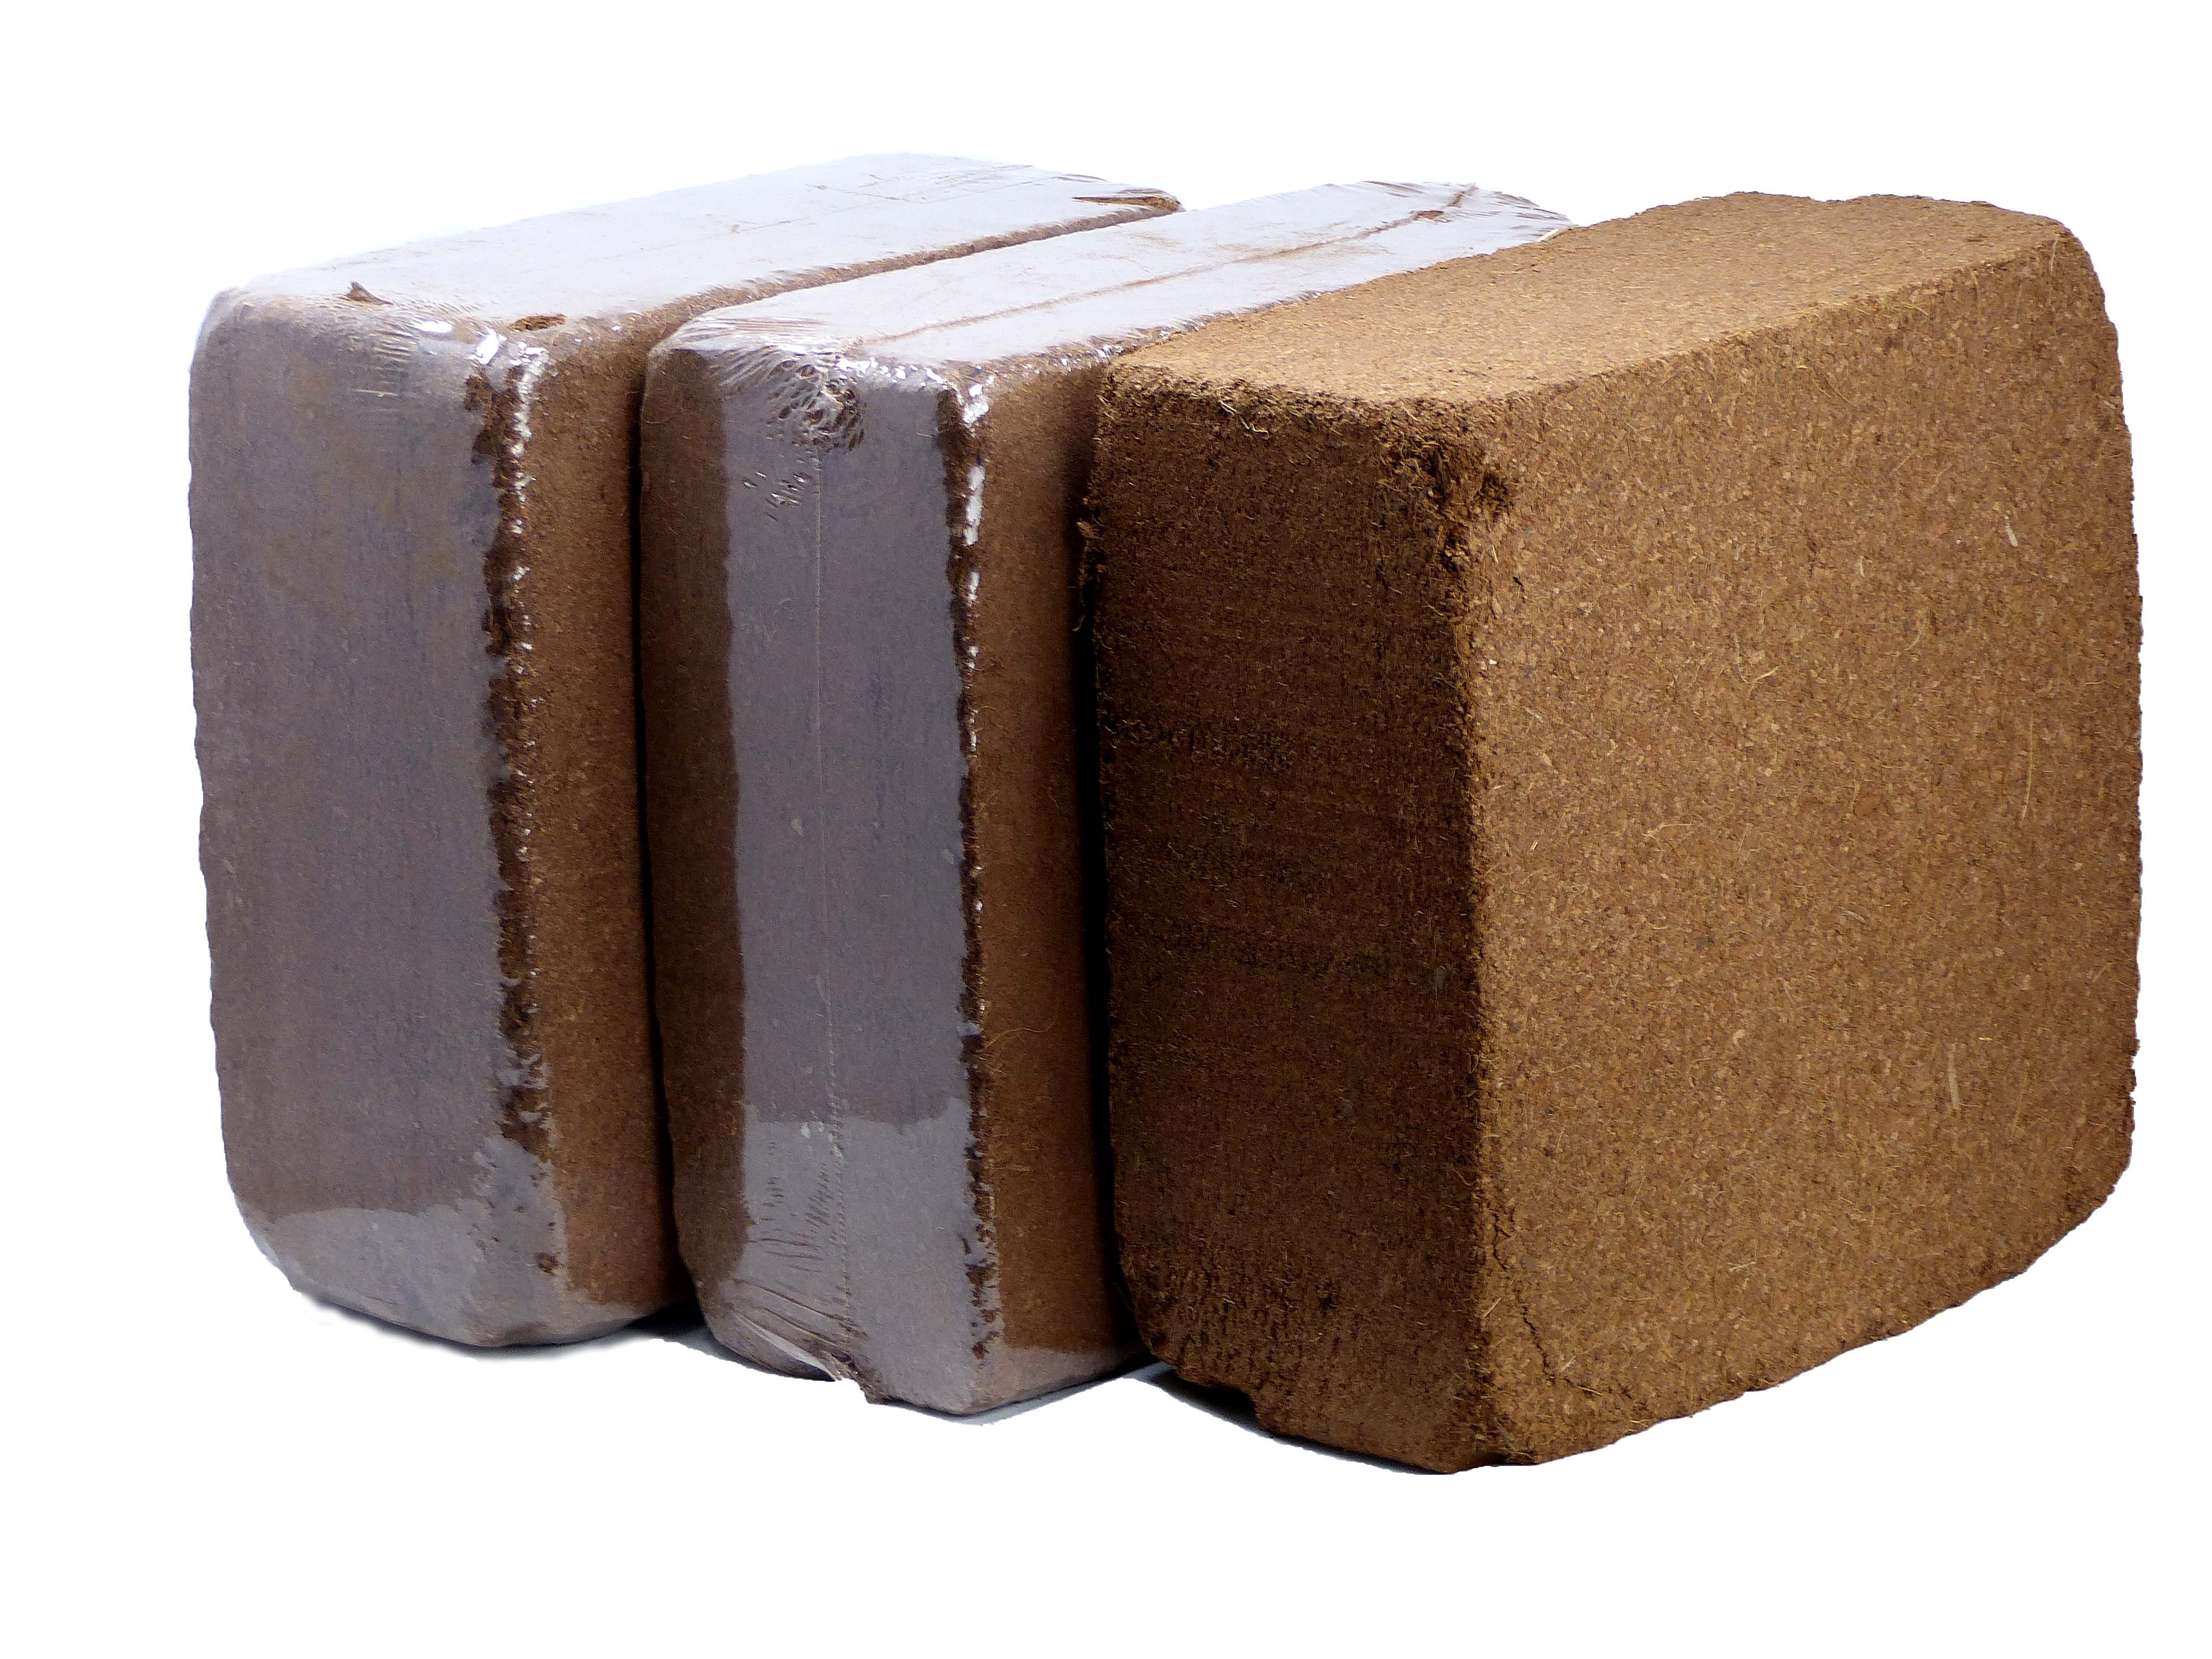 Kokosfaser Bodengrund maxi - 3er-Set